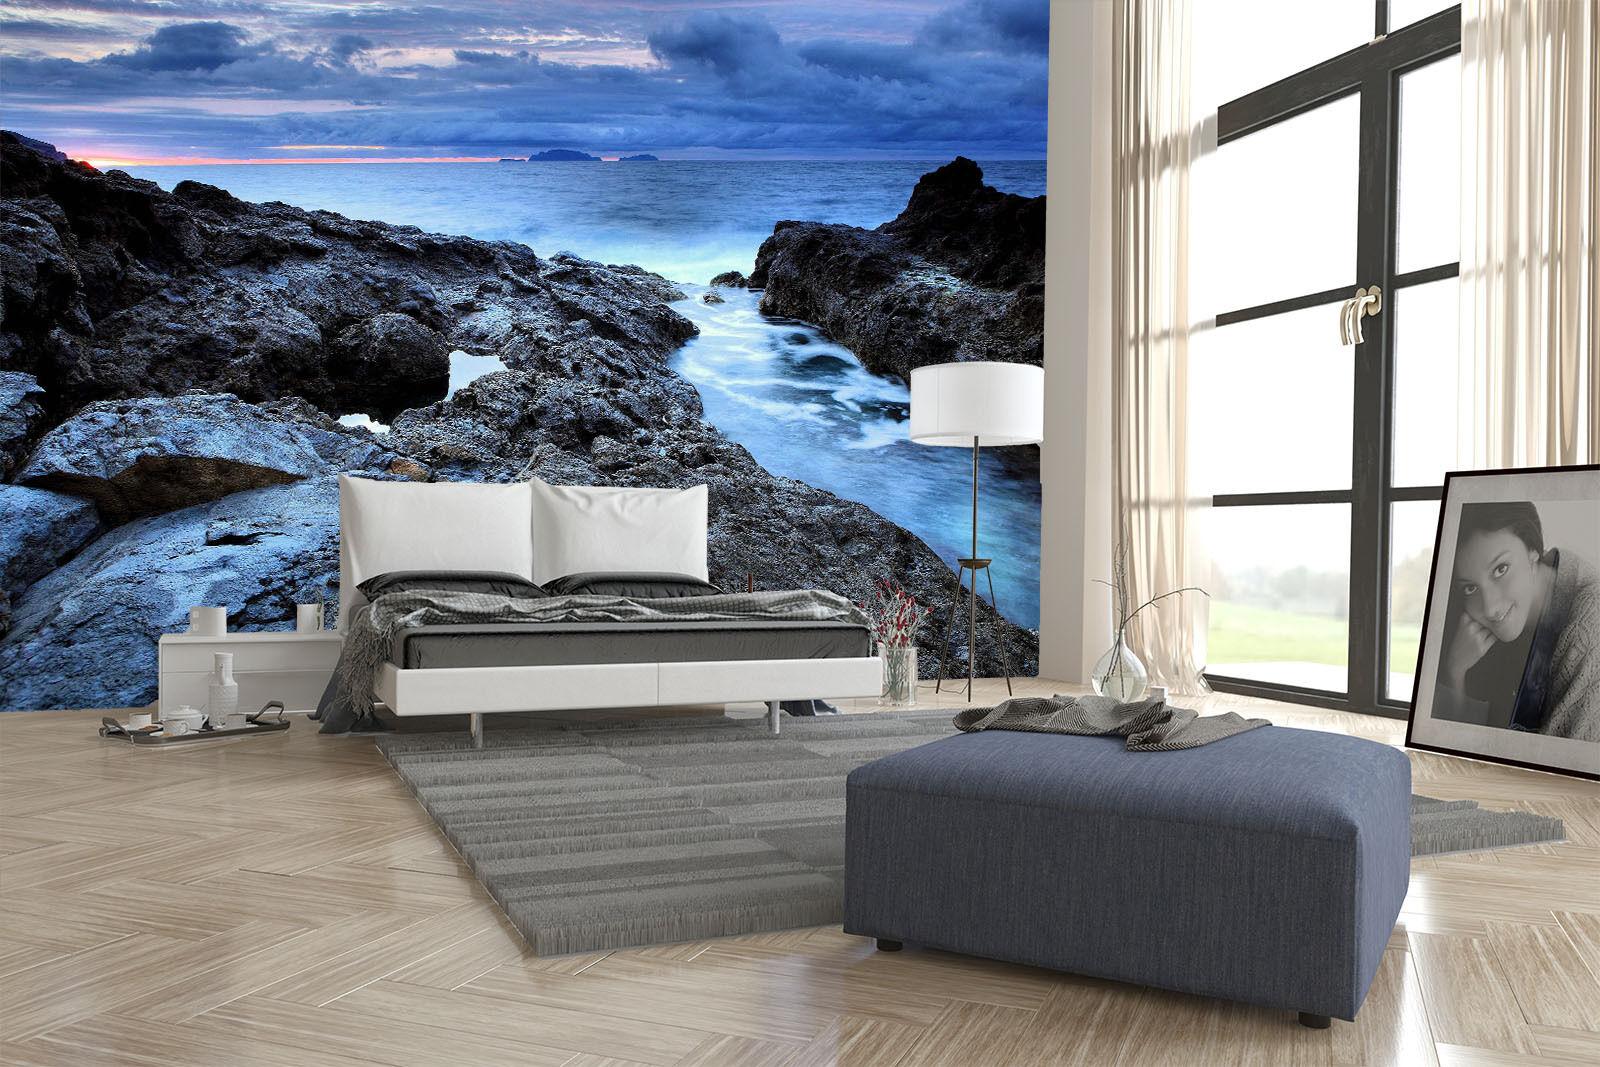 3D Paesaggio Parete Murale Foto Carta da parati immagine sfondo muro stampa